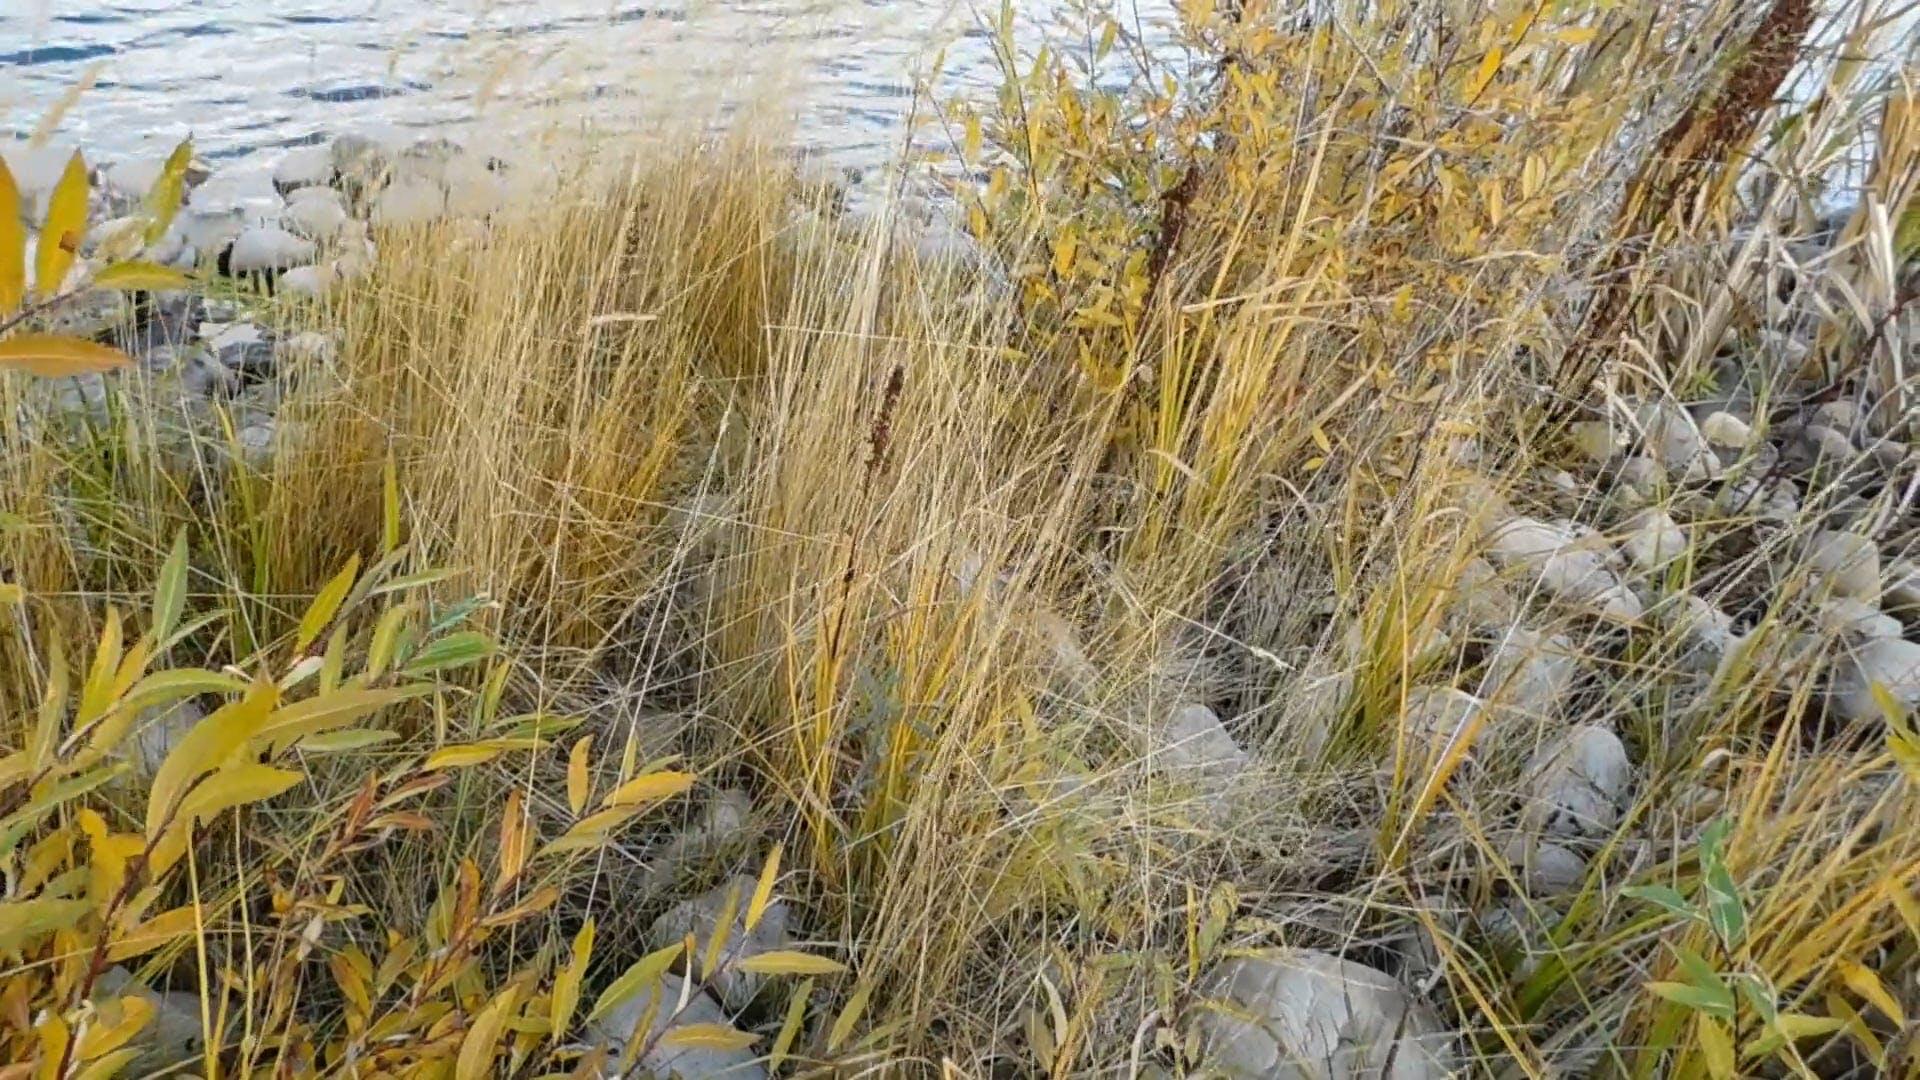 Tall Grass Near The Lake